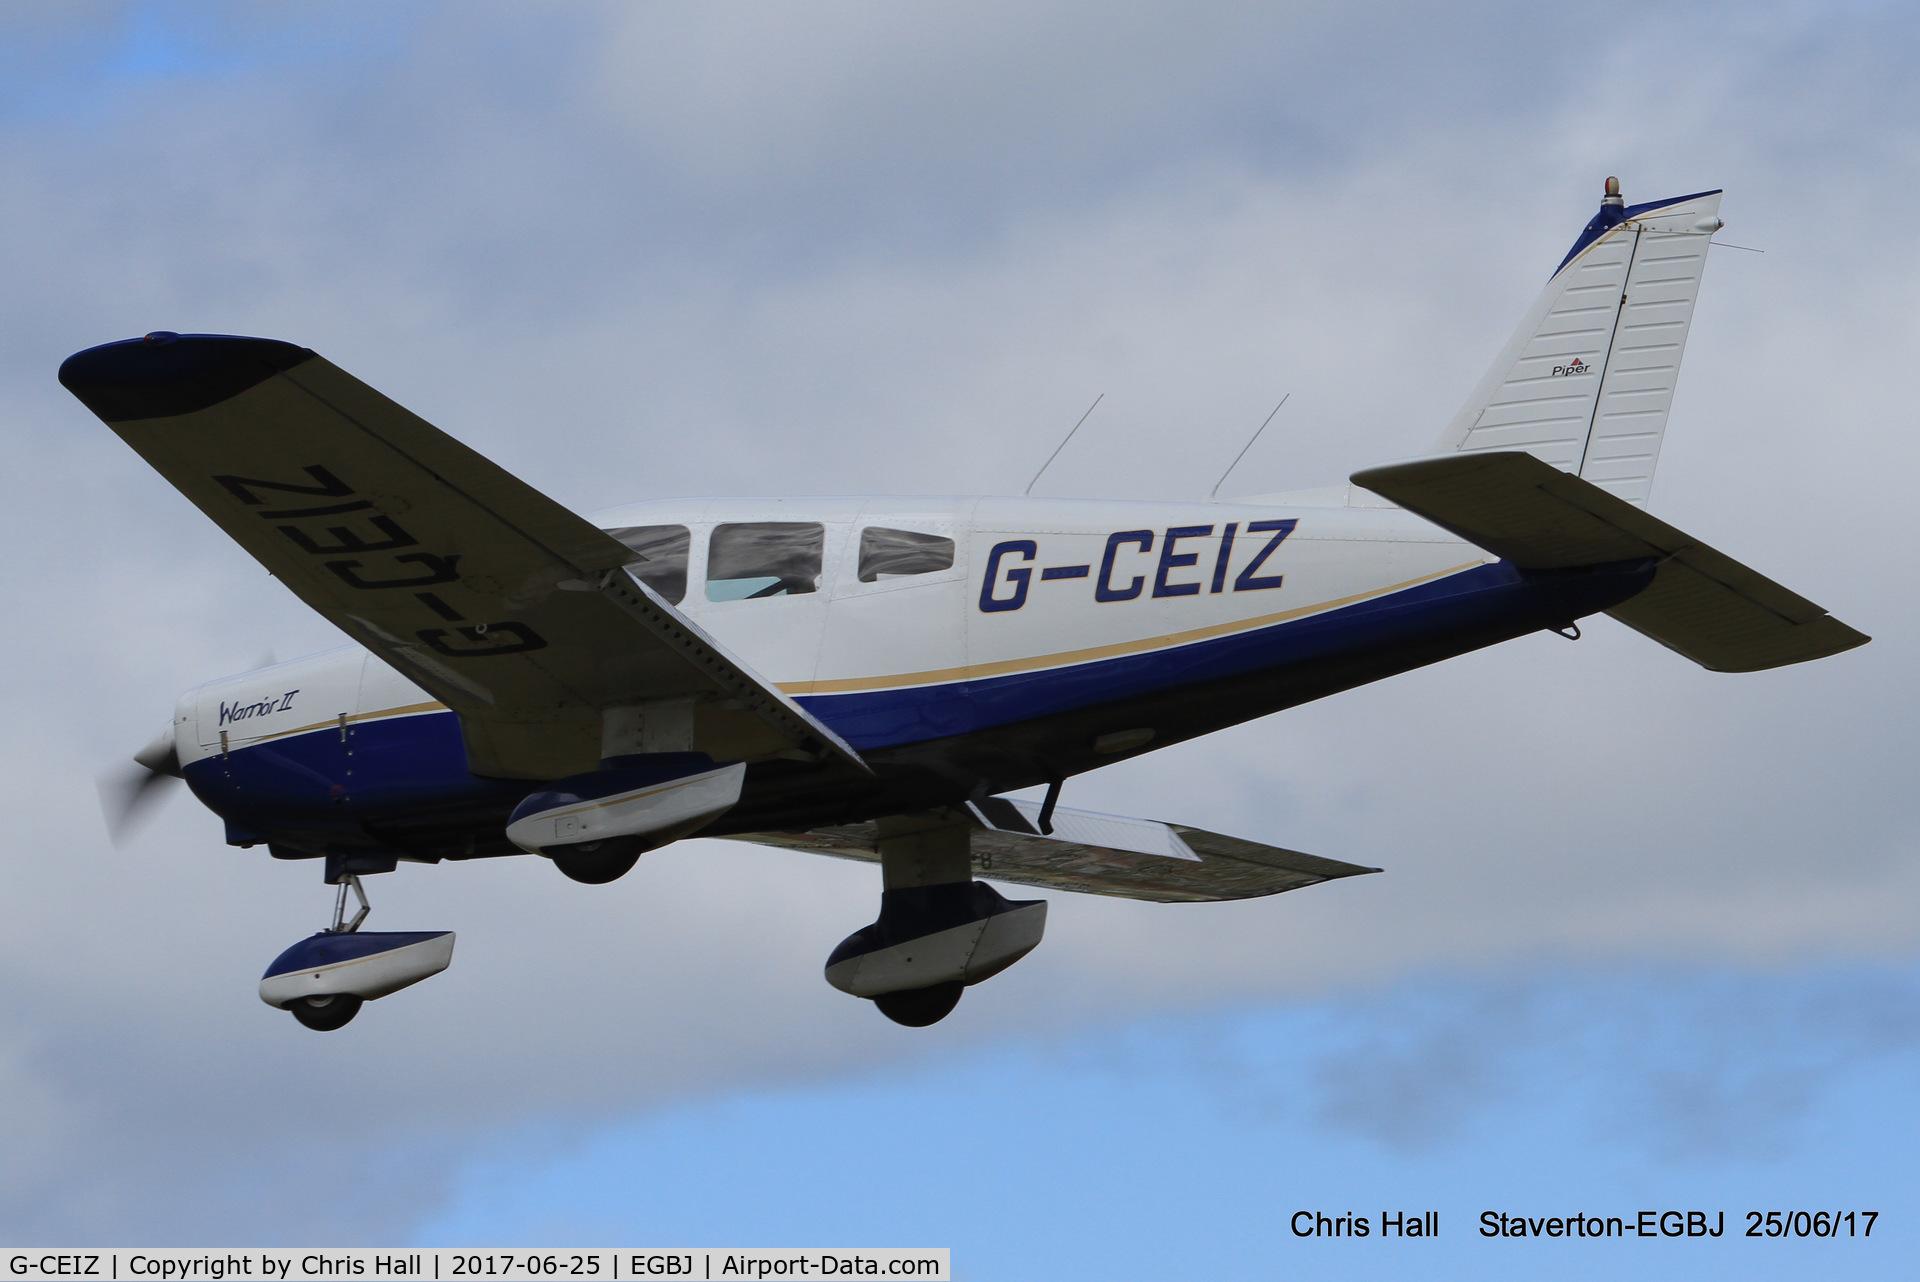 G-CEIZ, 1980 Piper PA-28-161 Cherokee Warrior II C/N 28-8116076, Project Propeller at Staverton